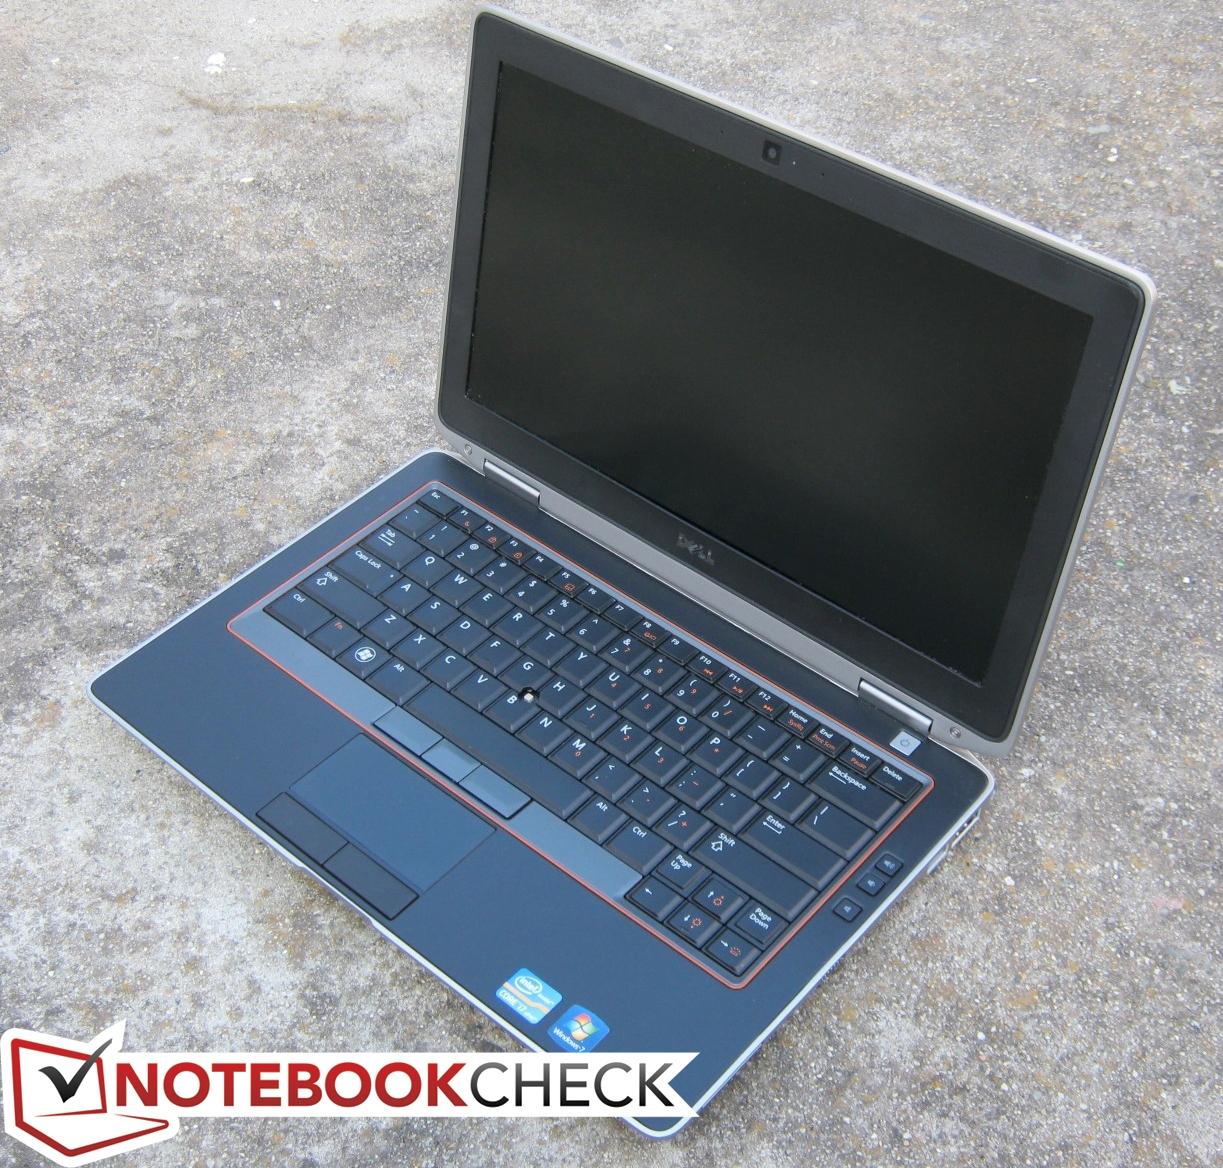 "Dell Latitude E6320 13,3"" Notebook mit Core i5, 8GB-Ram, 256GB SSD, UMTS, W7Pro - generalüberholt - für 304,- bei Alternate Zackzack"